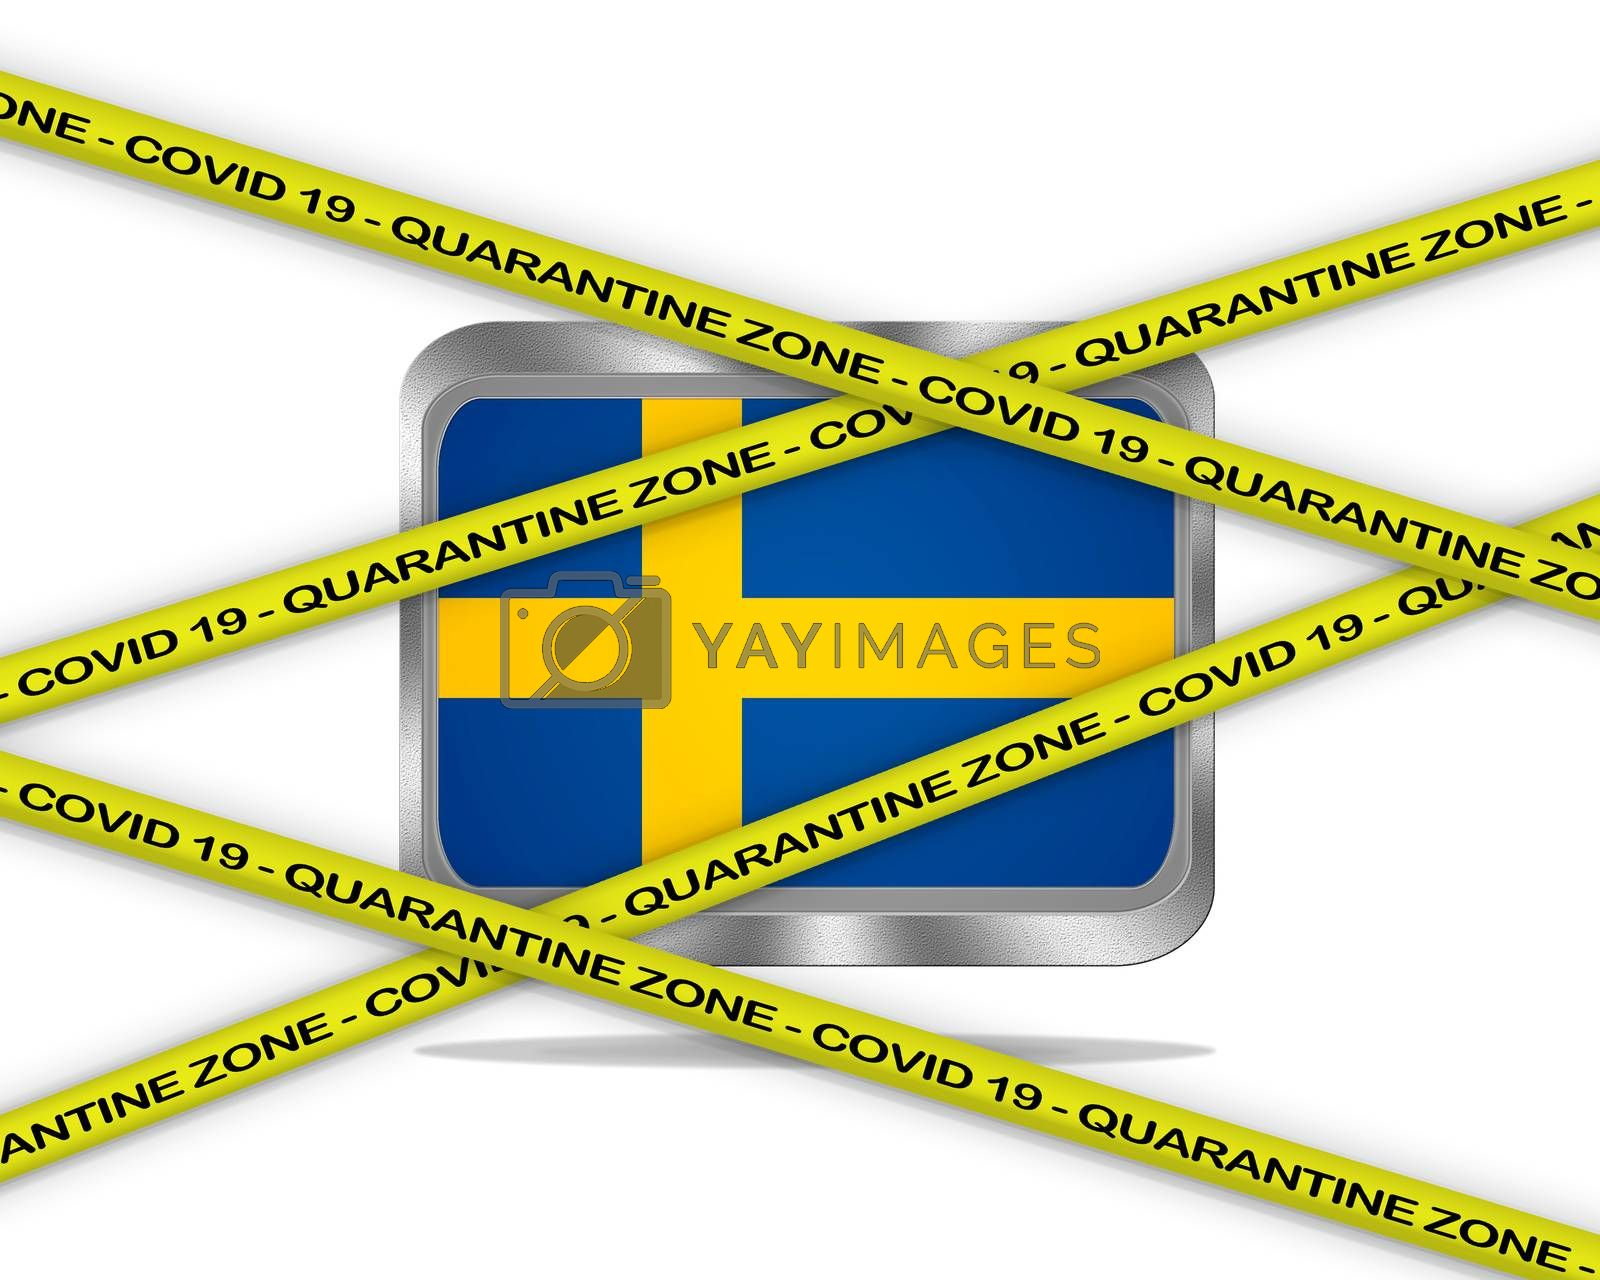 COVID-19 warning yellow ribbon written with: Quarantine zone Cover 19 on Sweden flag illustration. Coronavirus danger area, quarantined country.